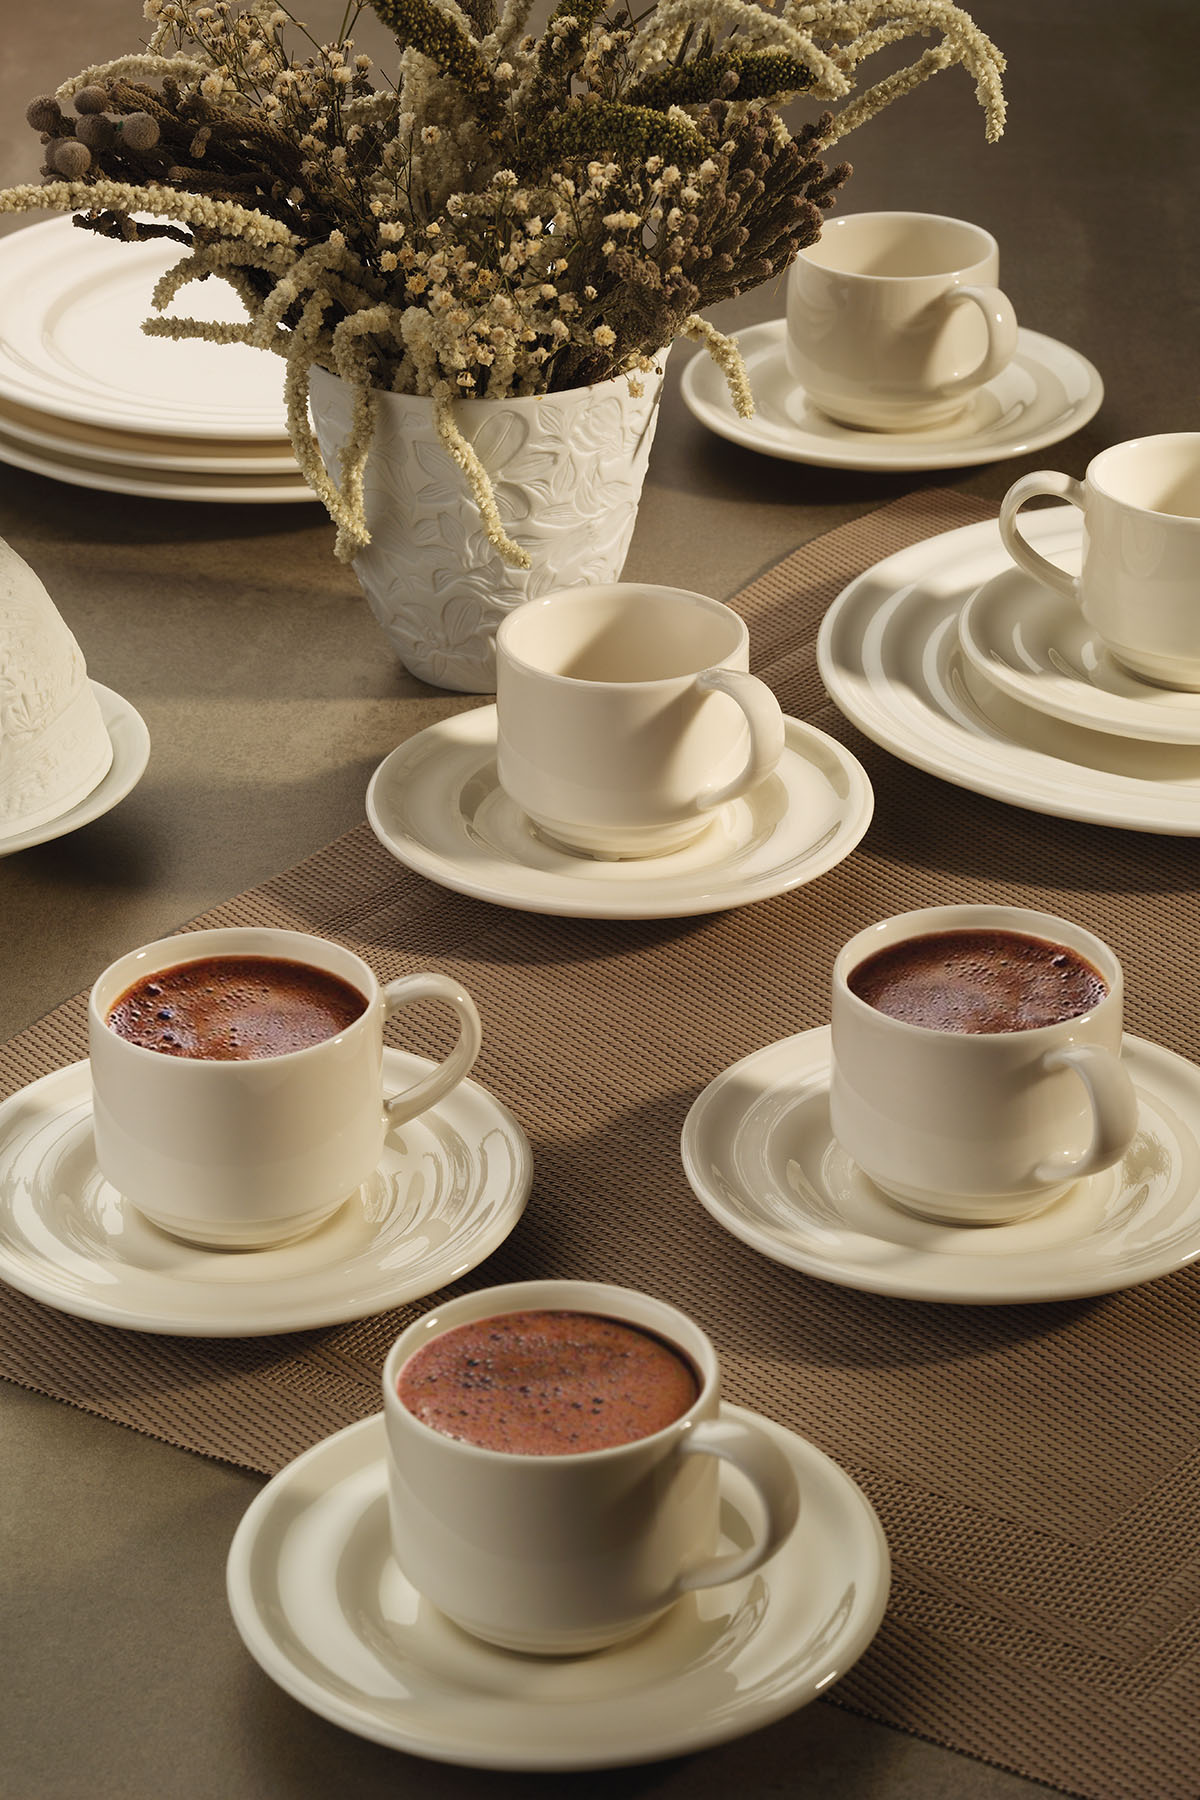 Kütahya Porselen Tuvana Kahve Takımı Krem